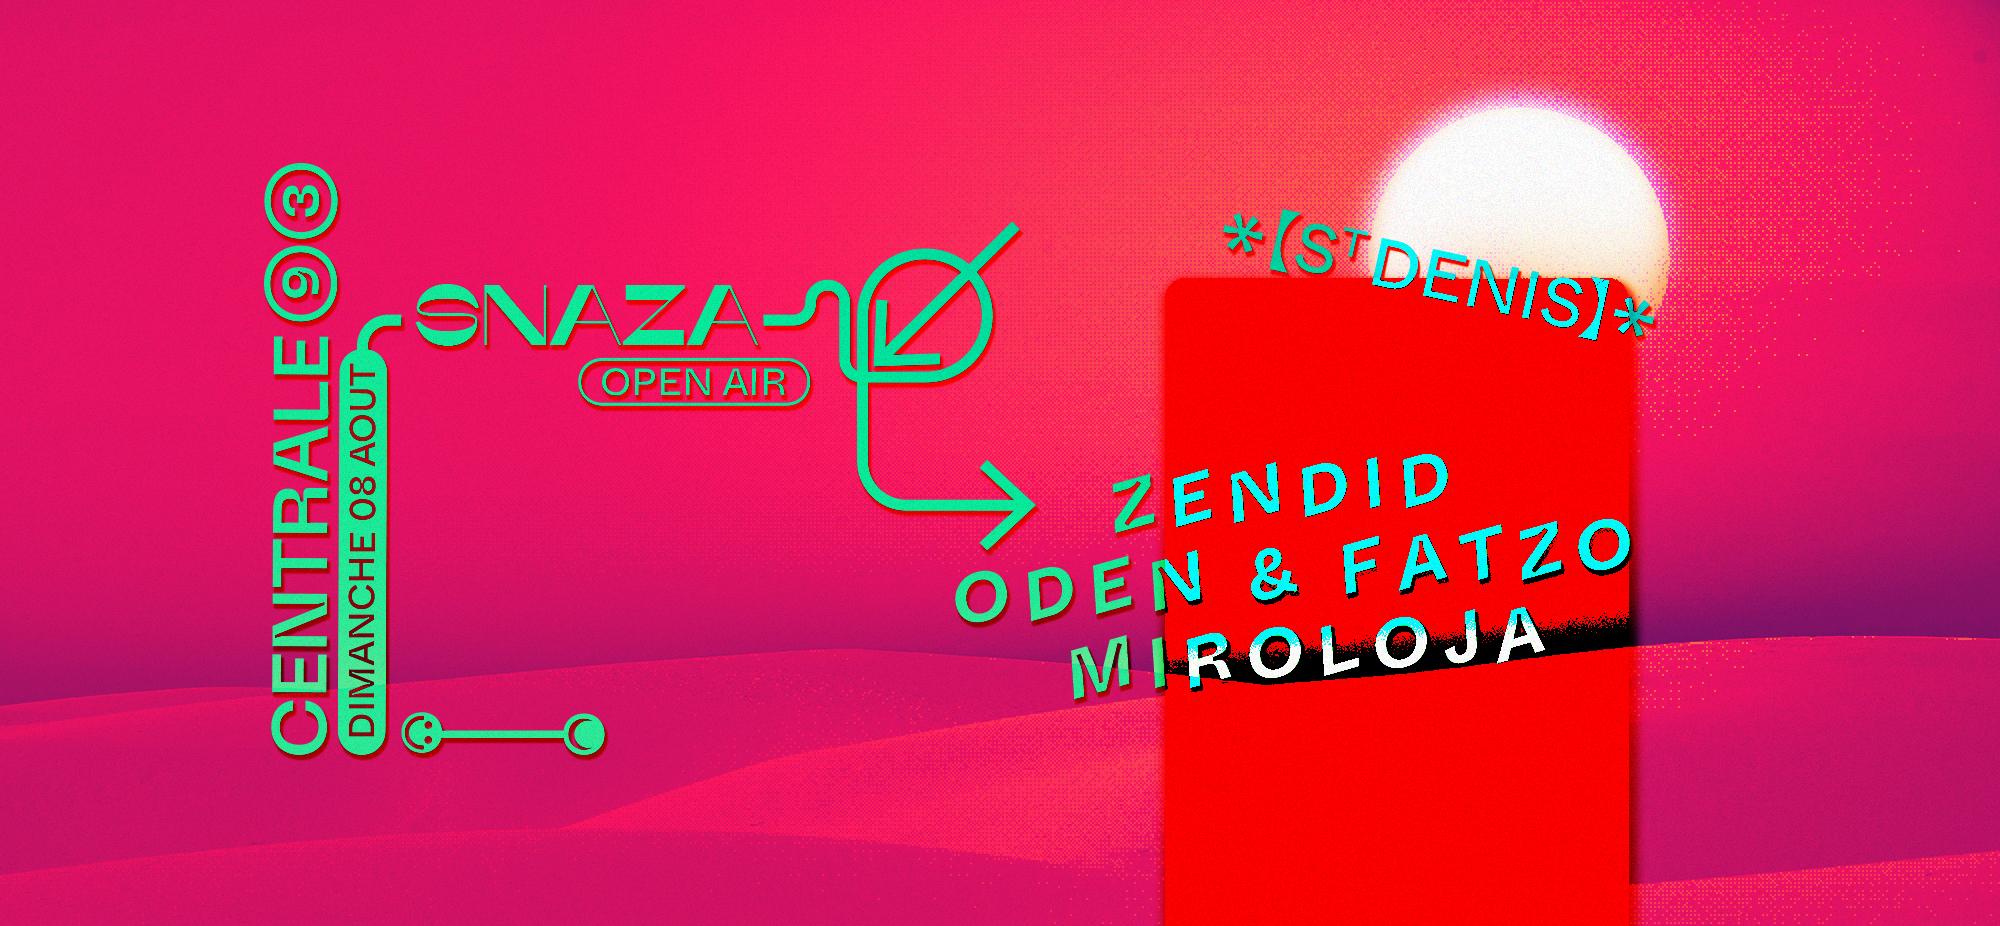 Centrale93 x Snaza: Zendid, Oden & Fatzo, Miroloja